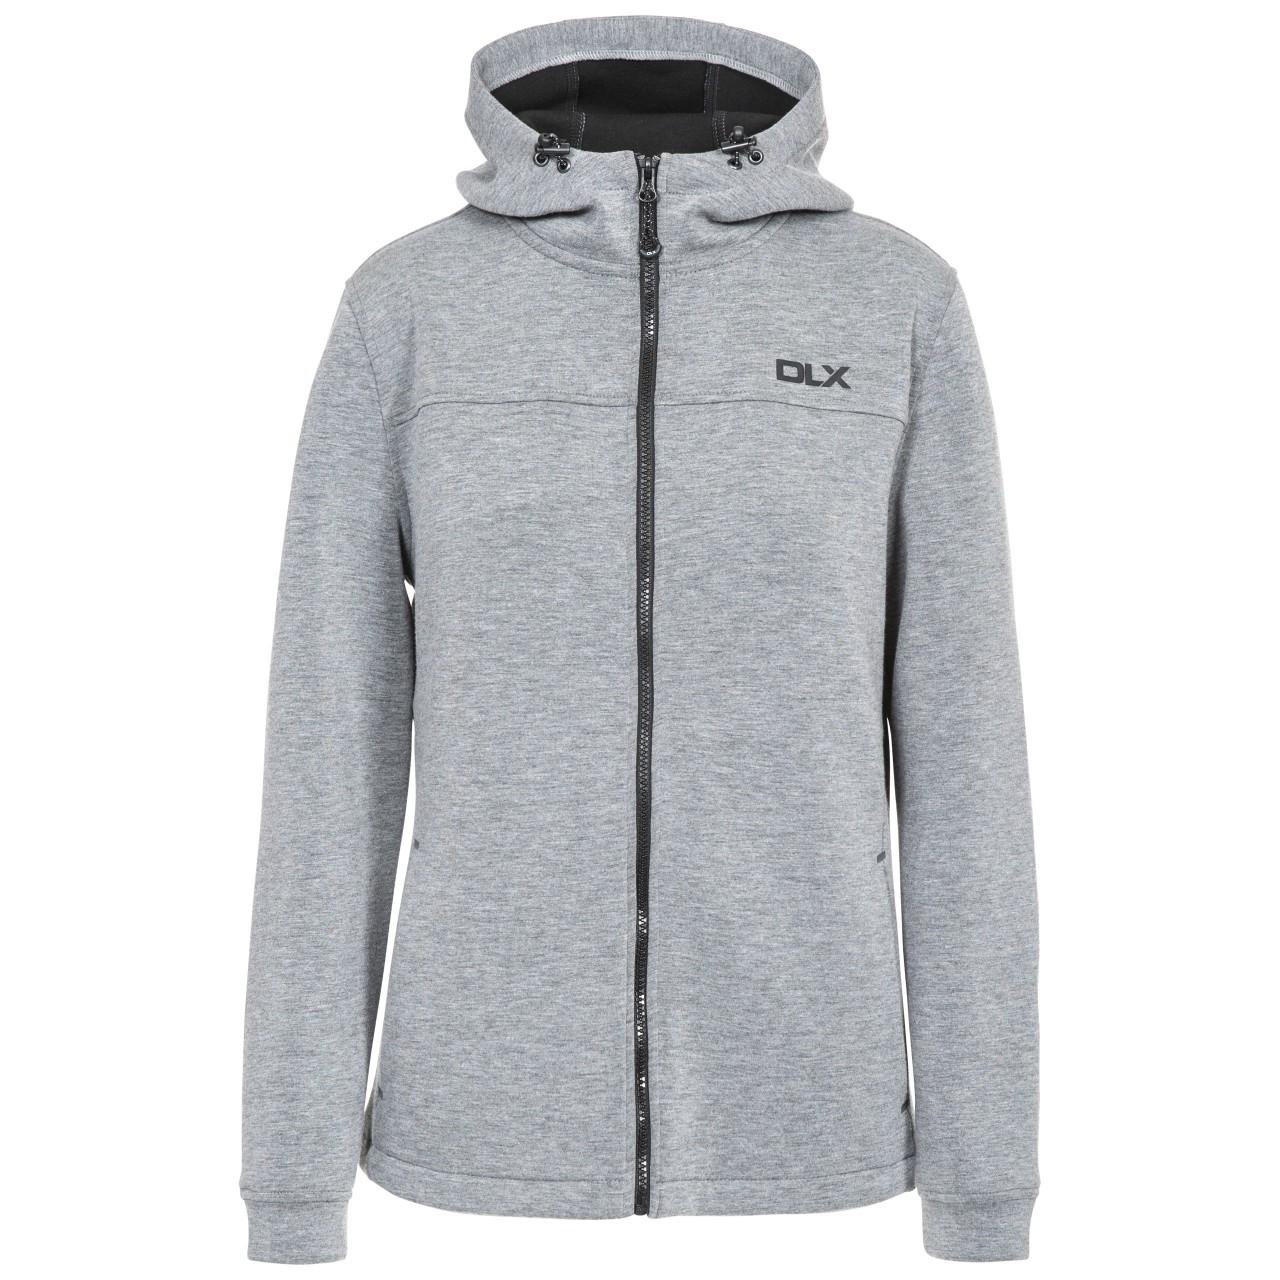 Trespass Womens/Ladies Tauri Active Jacket (XL) (Grey Marl)